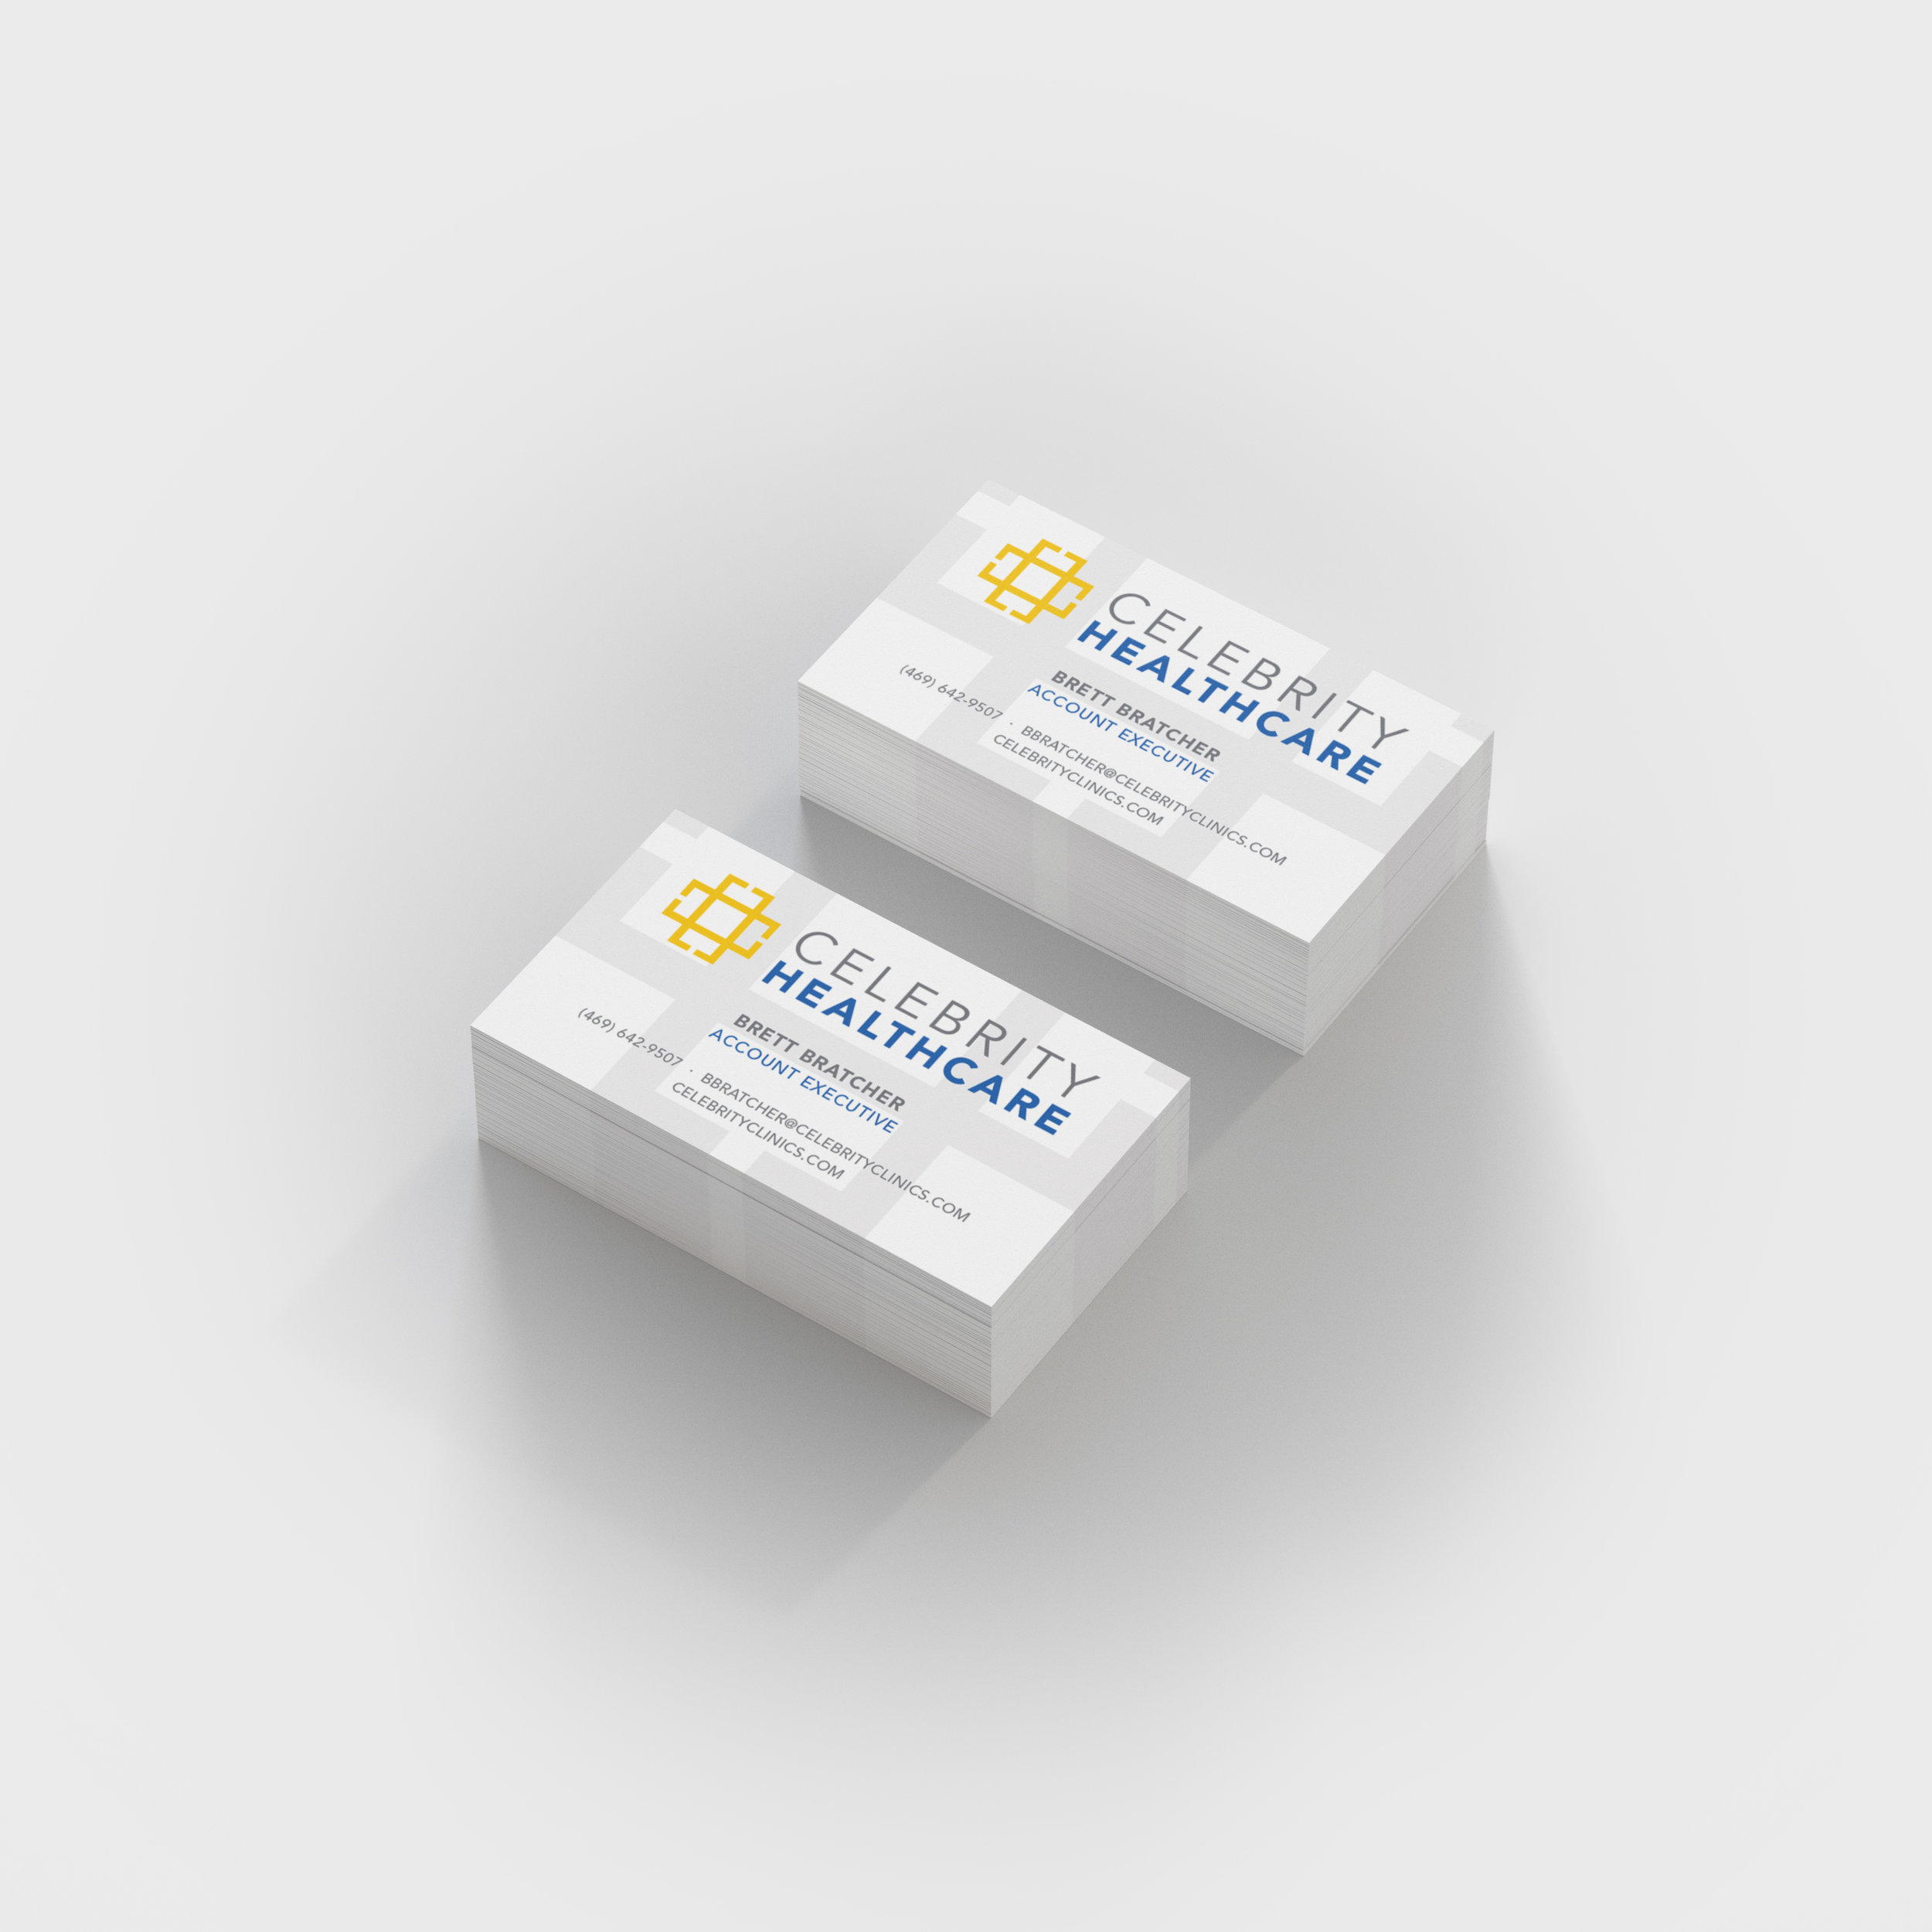 CelebrityHealthcare-BusinessCard-InPlace.jpg